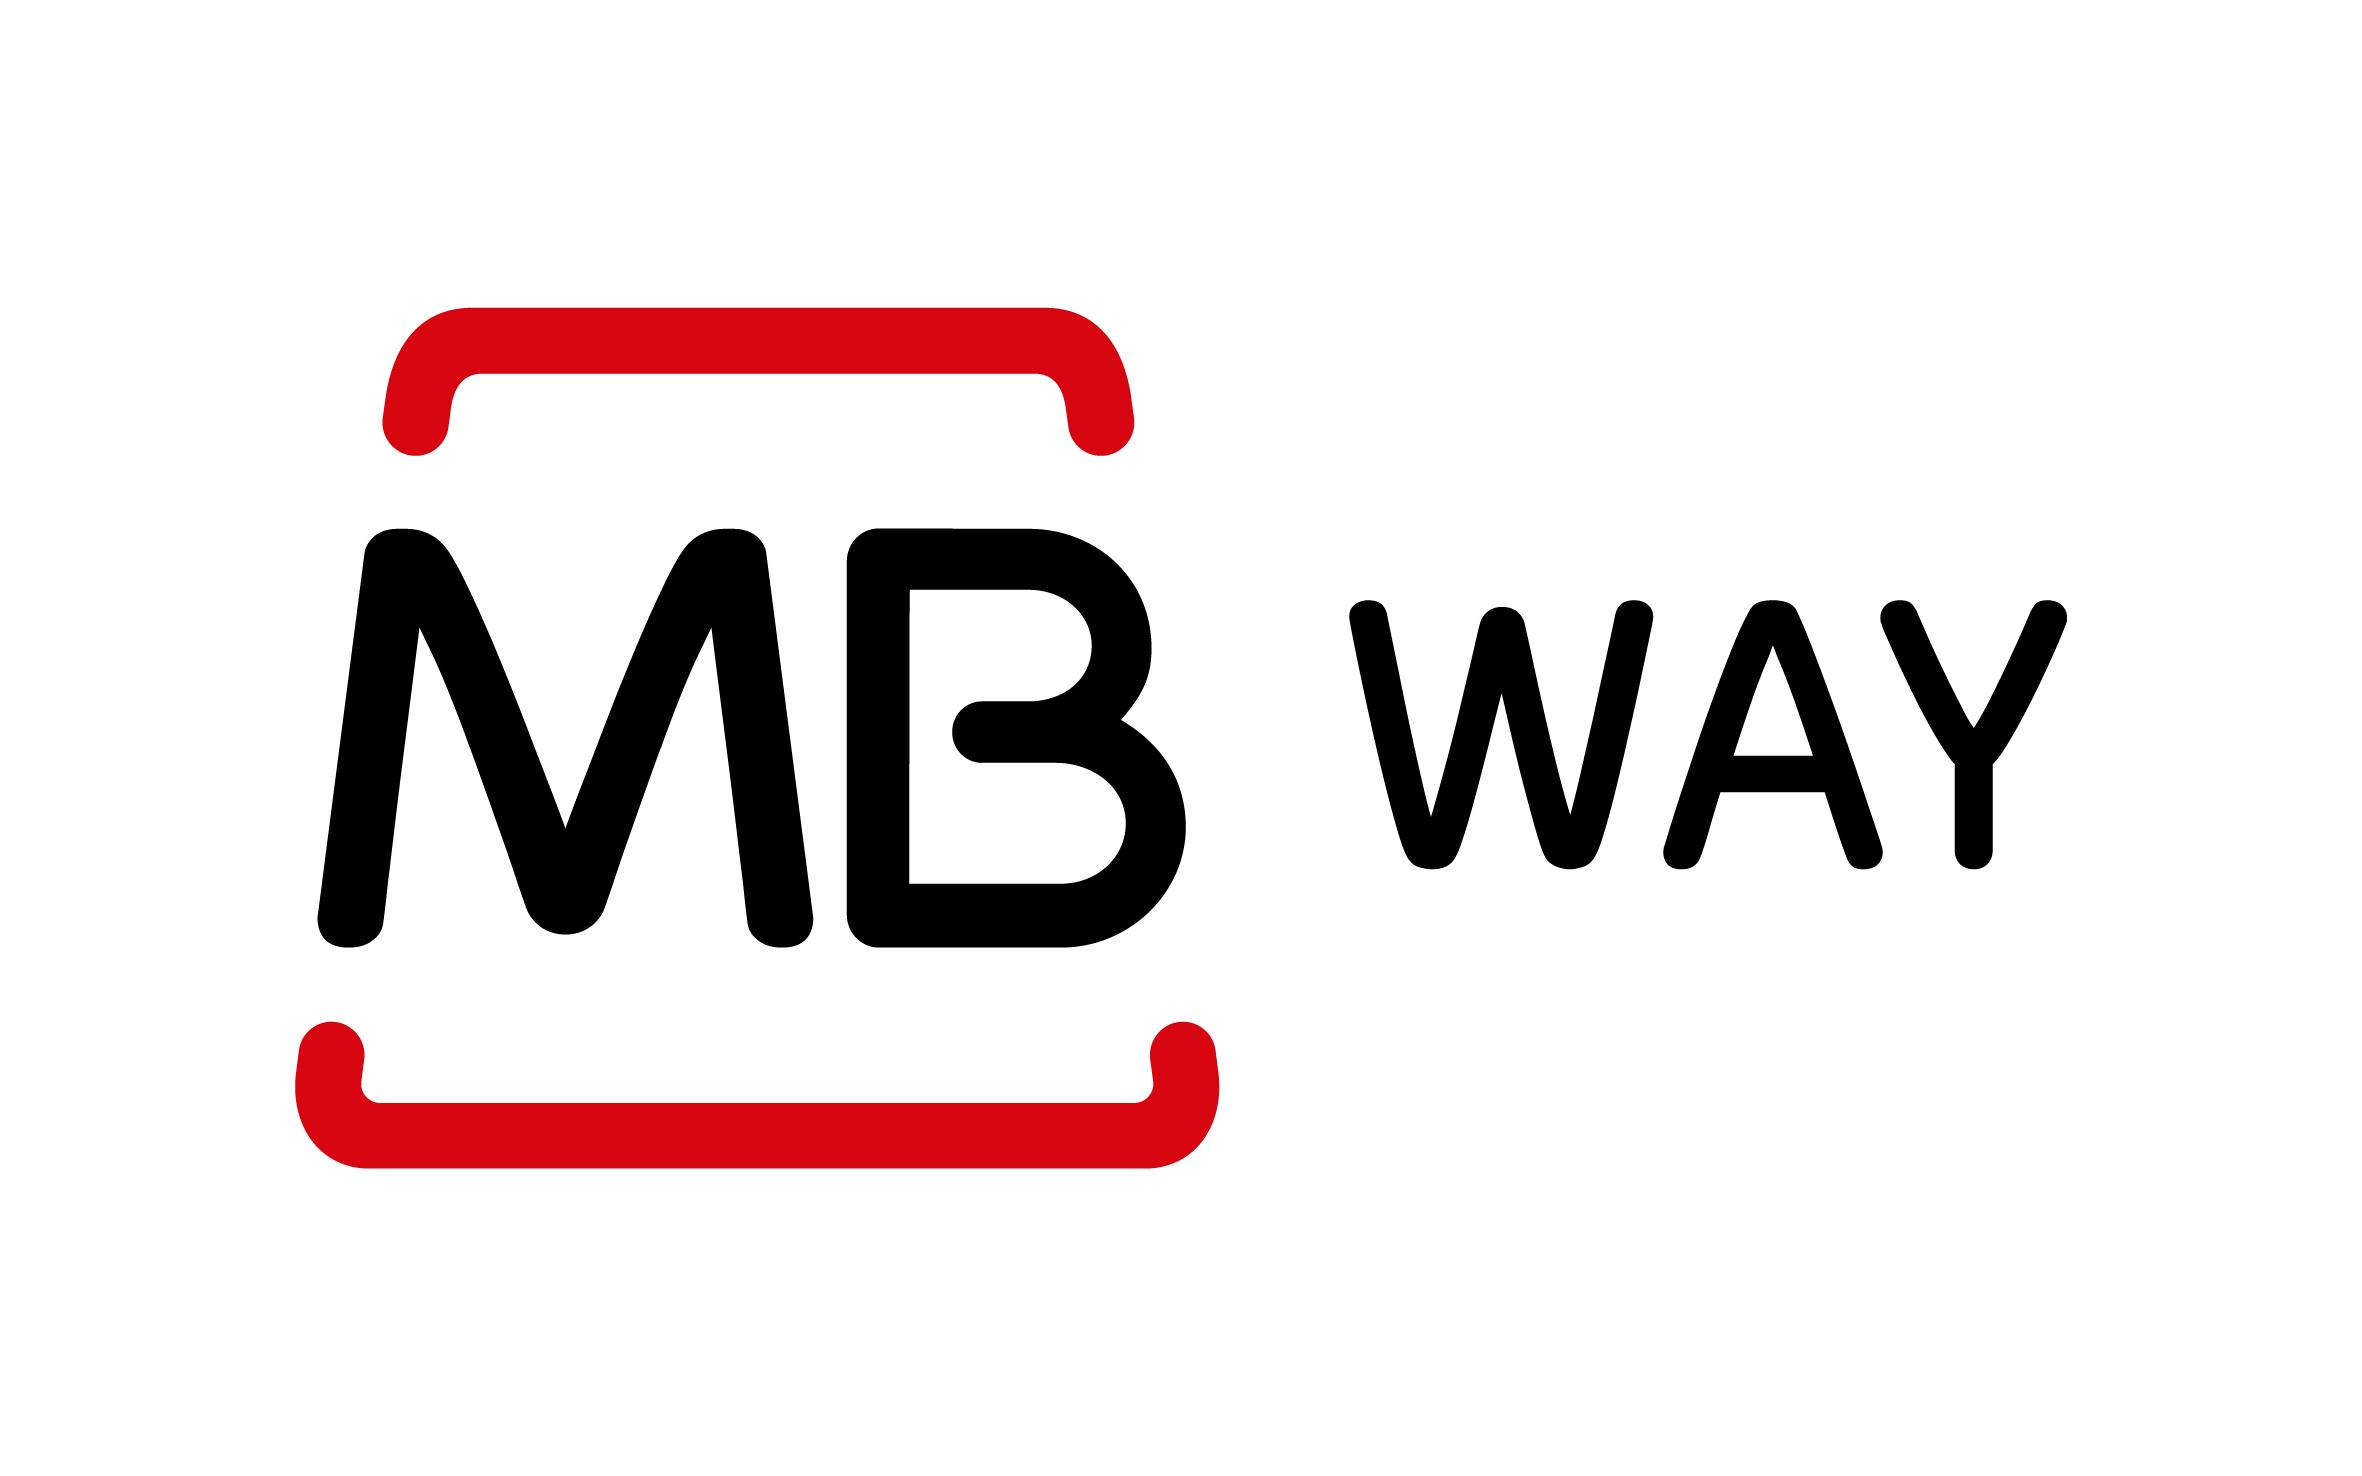 MBWAY_RGB_positivo